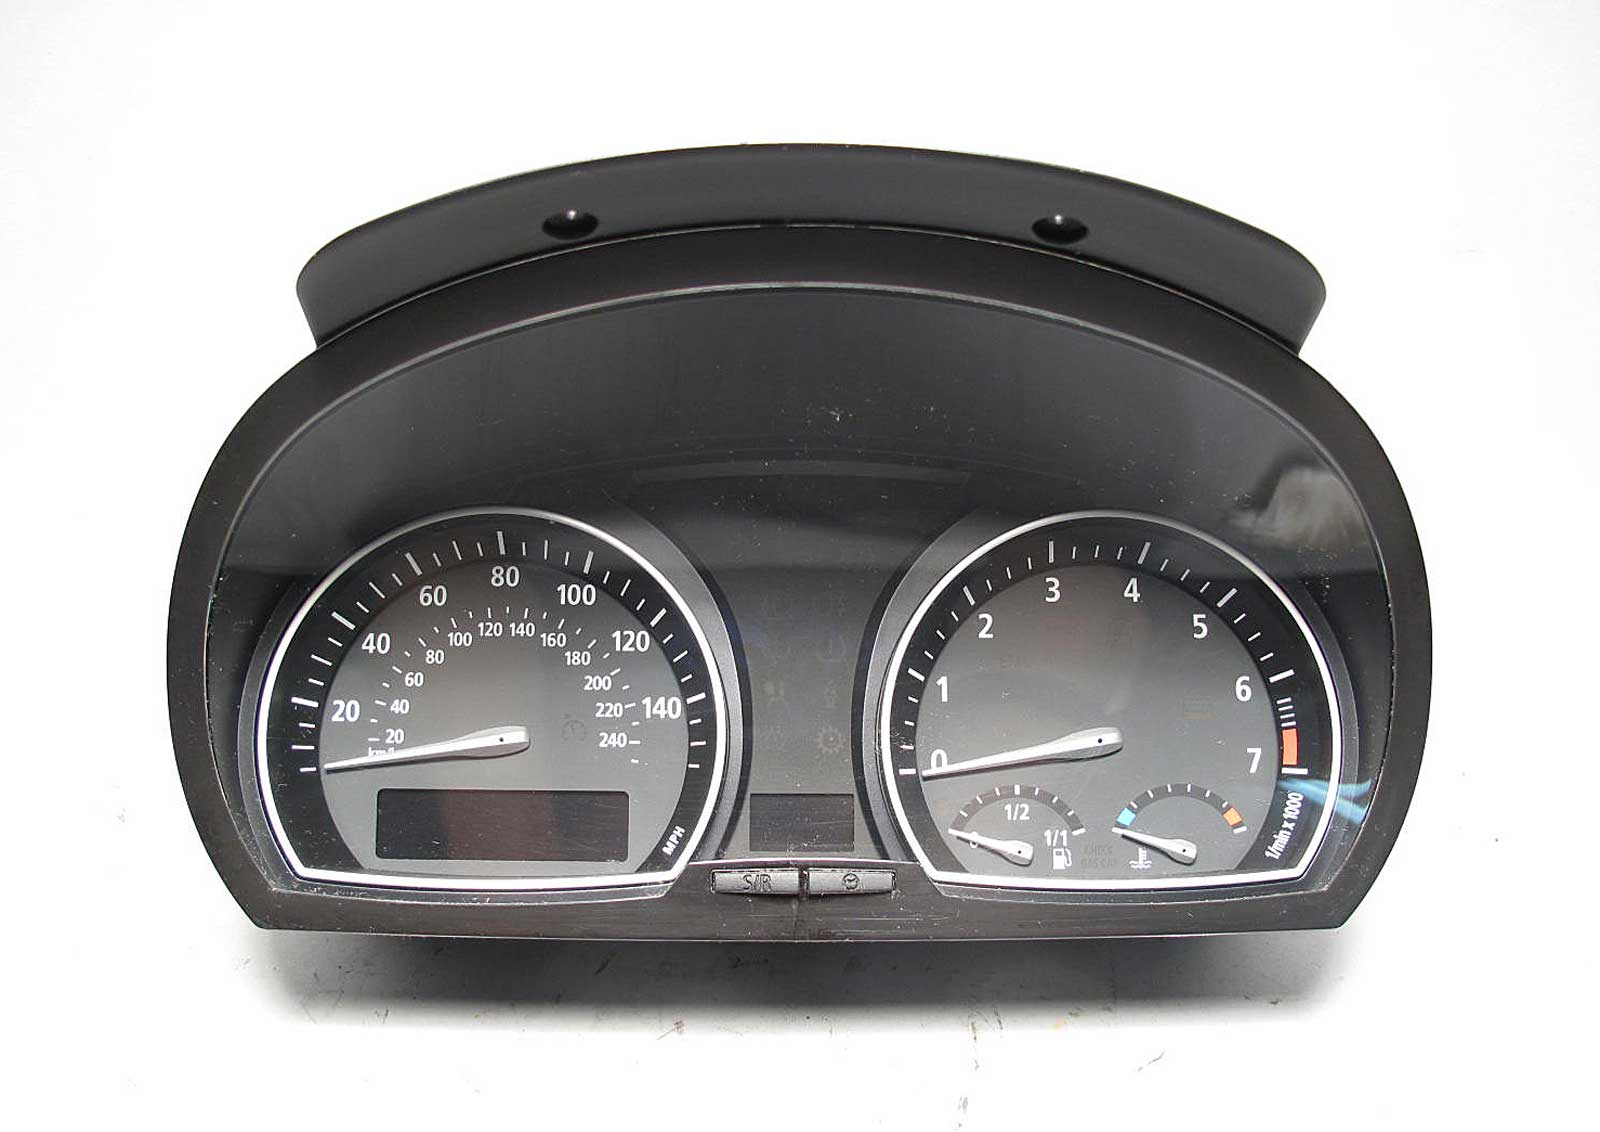 bmw e83 x3 sav auto trans instrument gauge cluster panel speedo tach 2004 2006 ebay. Black Bedroom Furniture Sets. Home Design Ideas